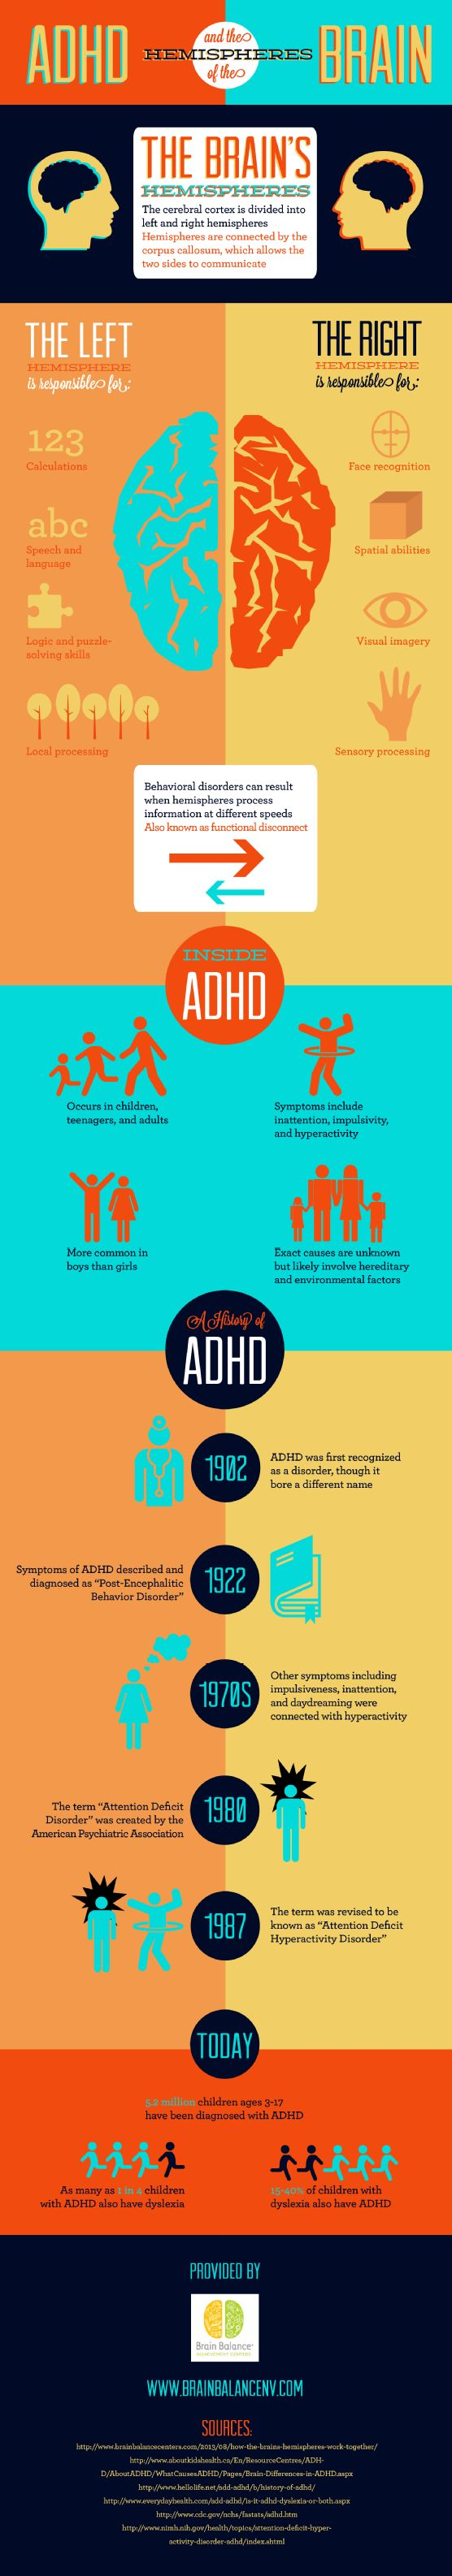 ADHD and The Brain Hemispheres (Infographic)